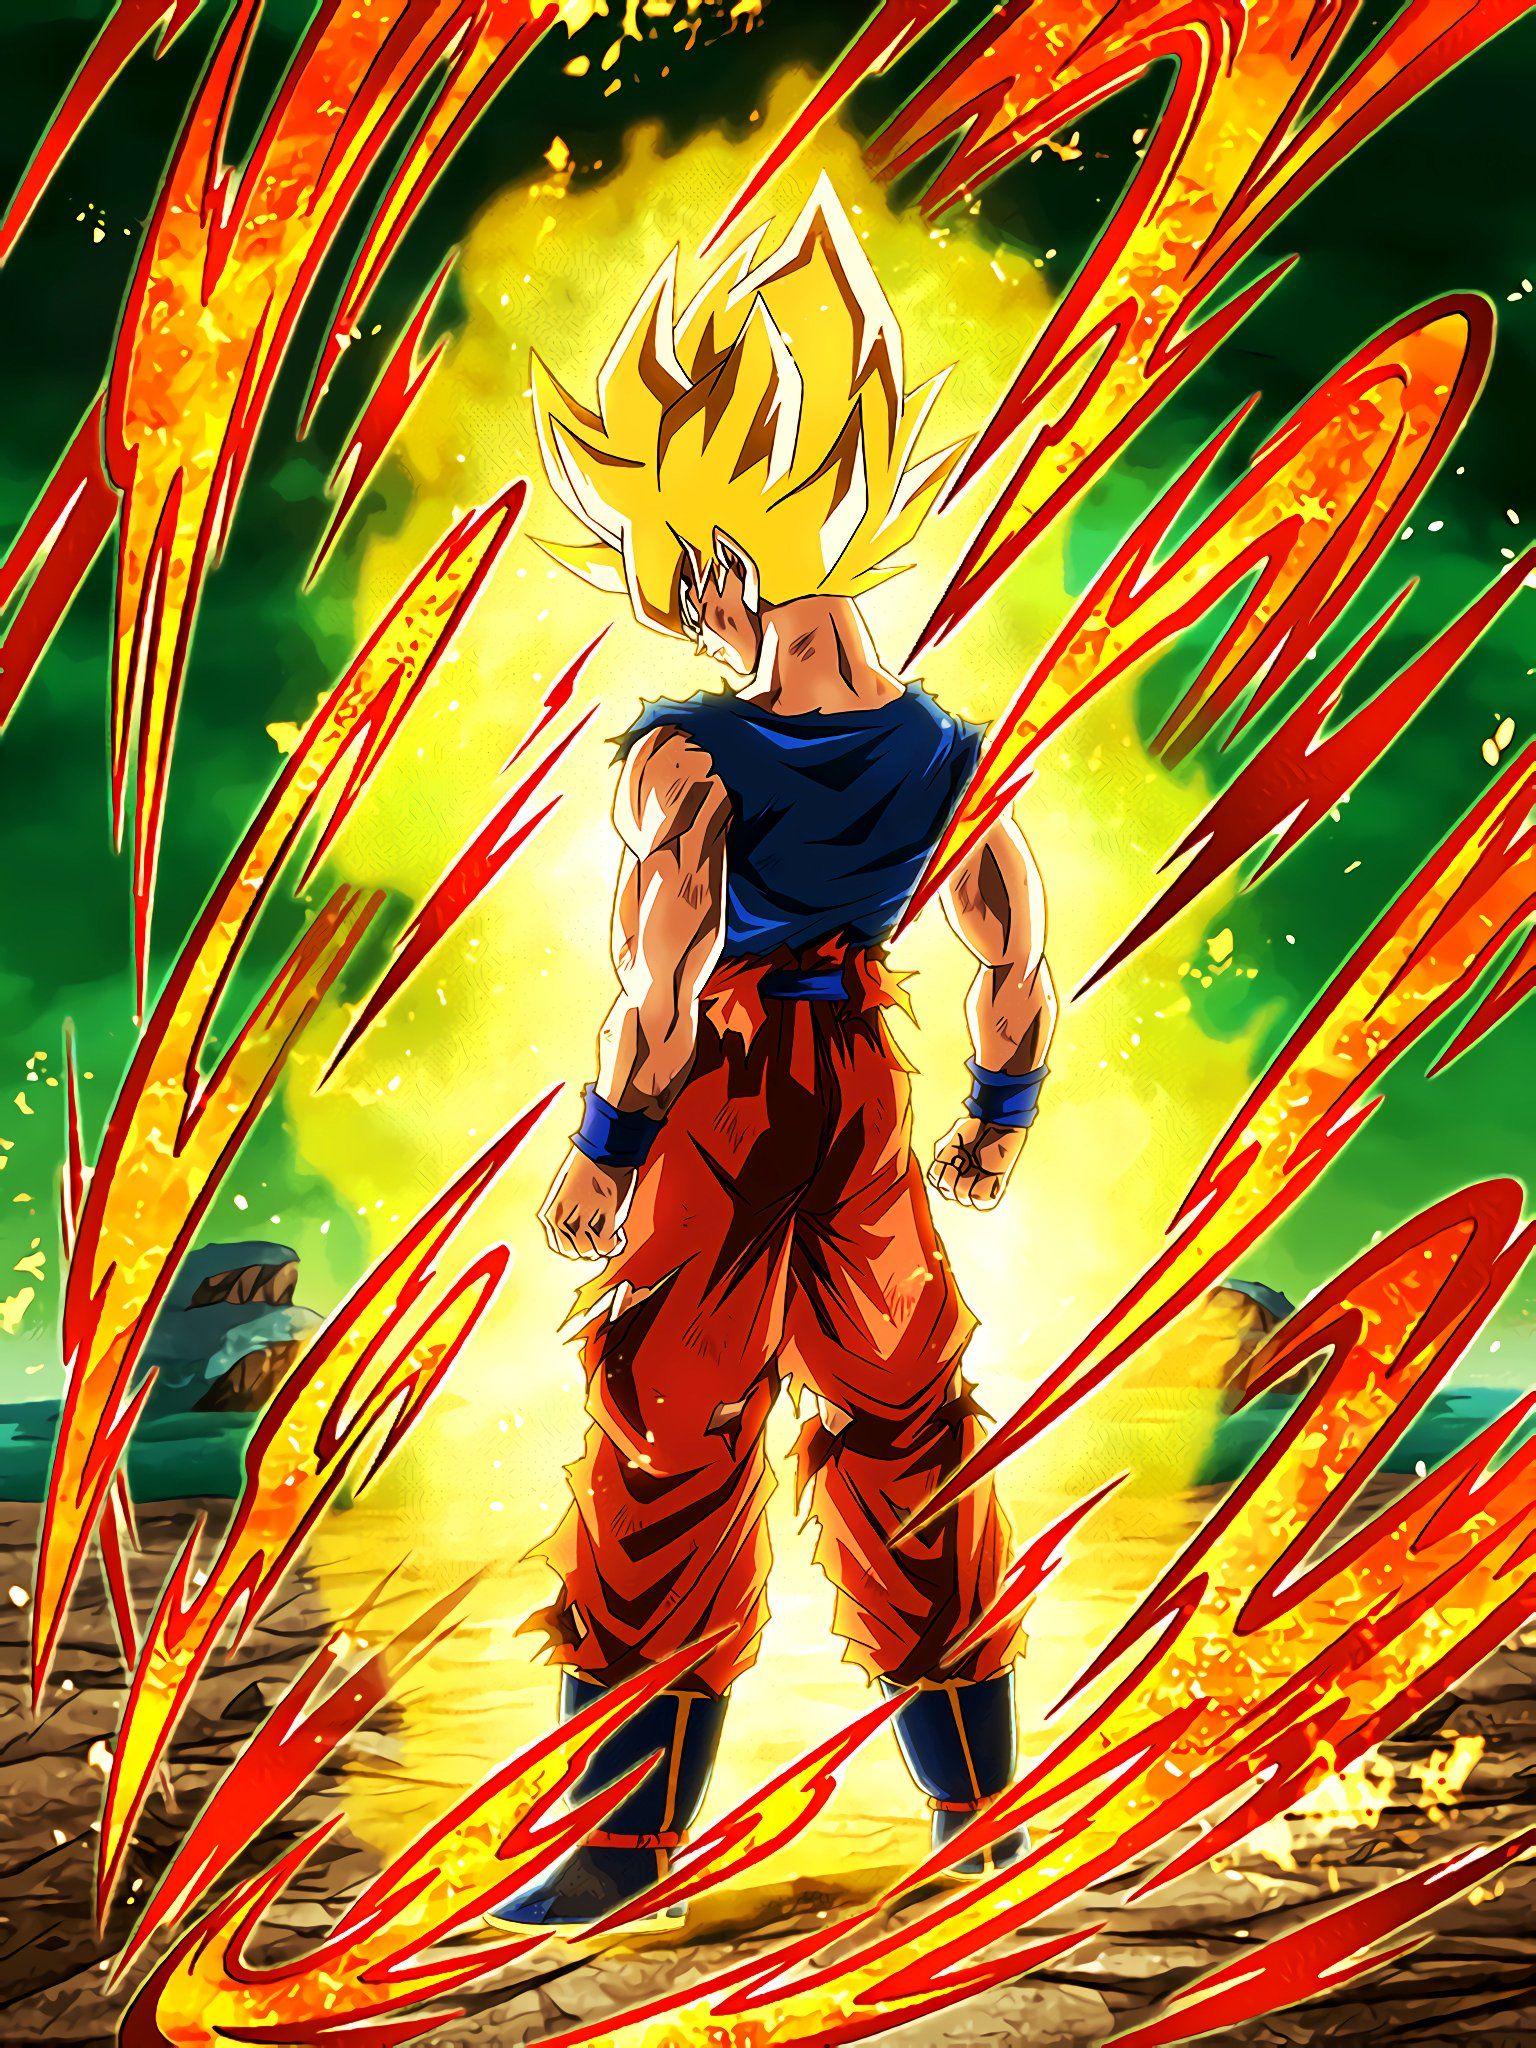 Hydros On Twitter Dragon Ball Artwork Dragon Ball Super Goku Dragon Ball Wallpapers